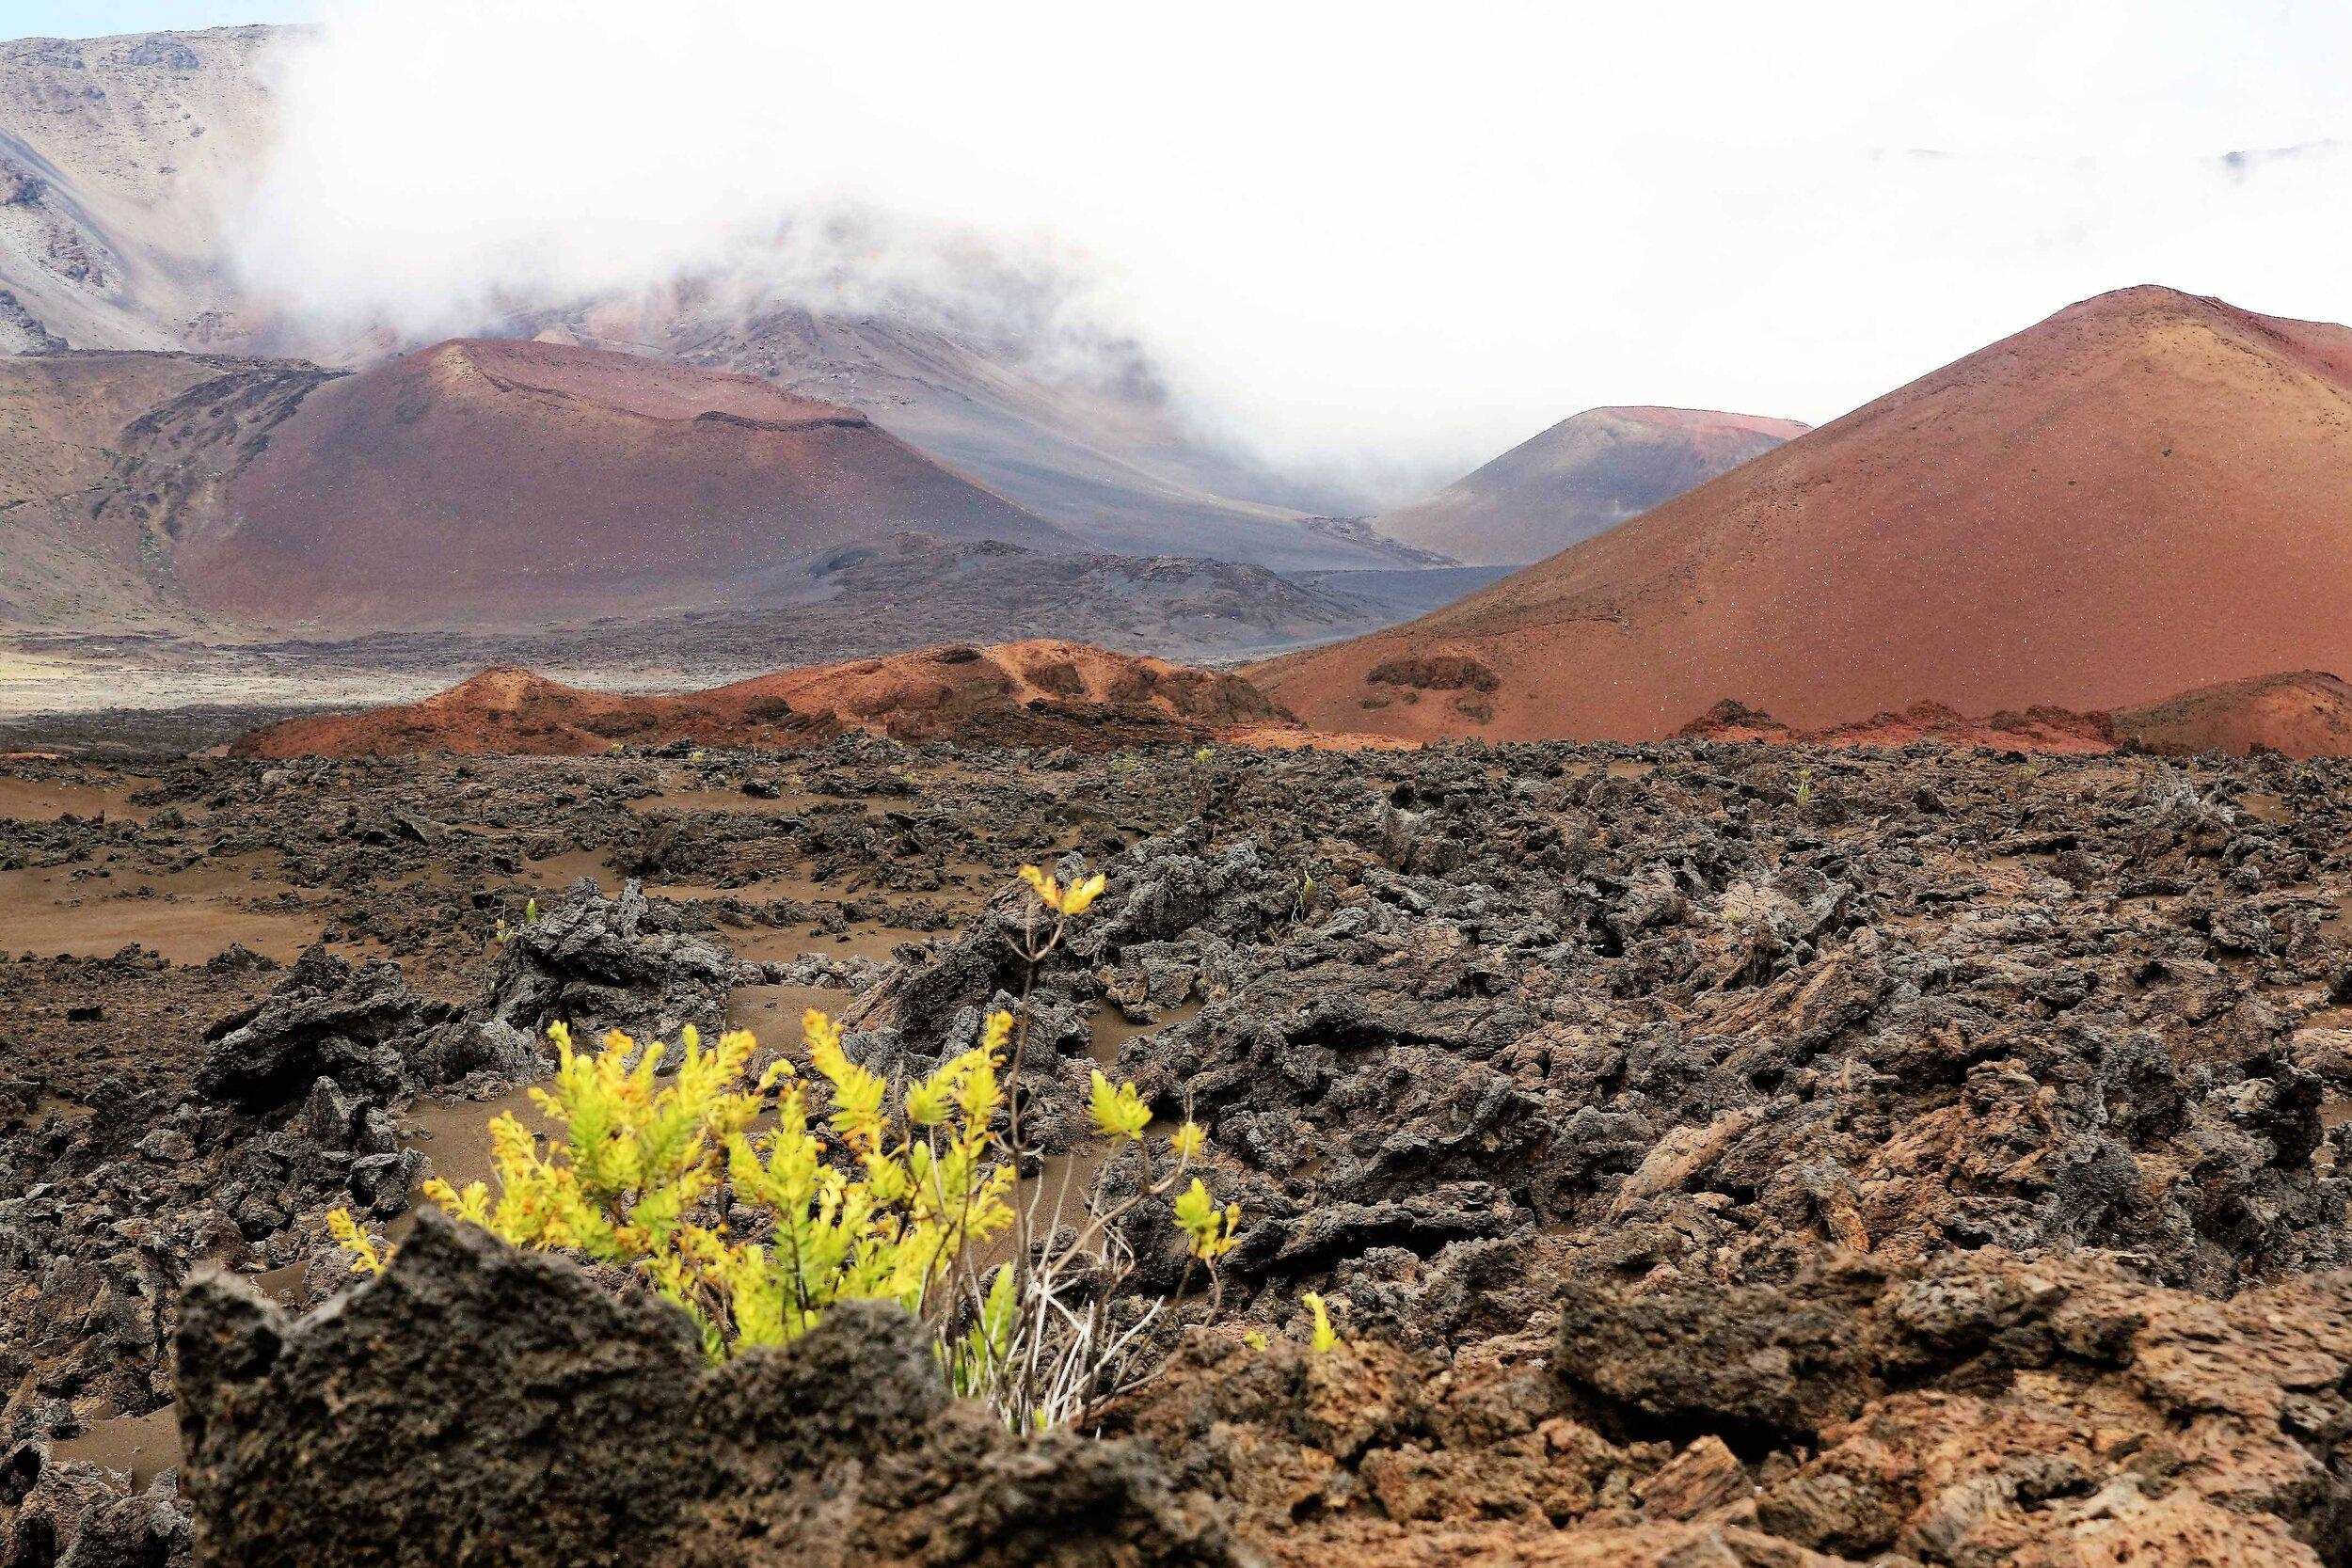 Harsh but delicate volcanic alpine landscape of Haleakala Crater, Maui.